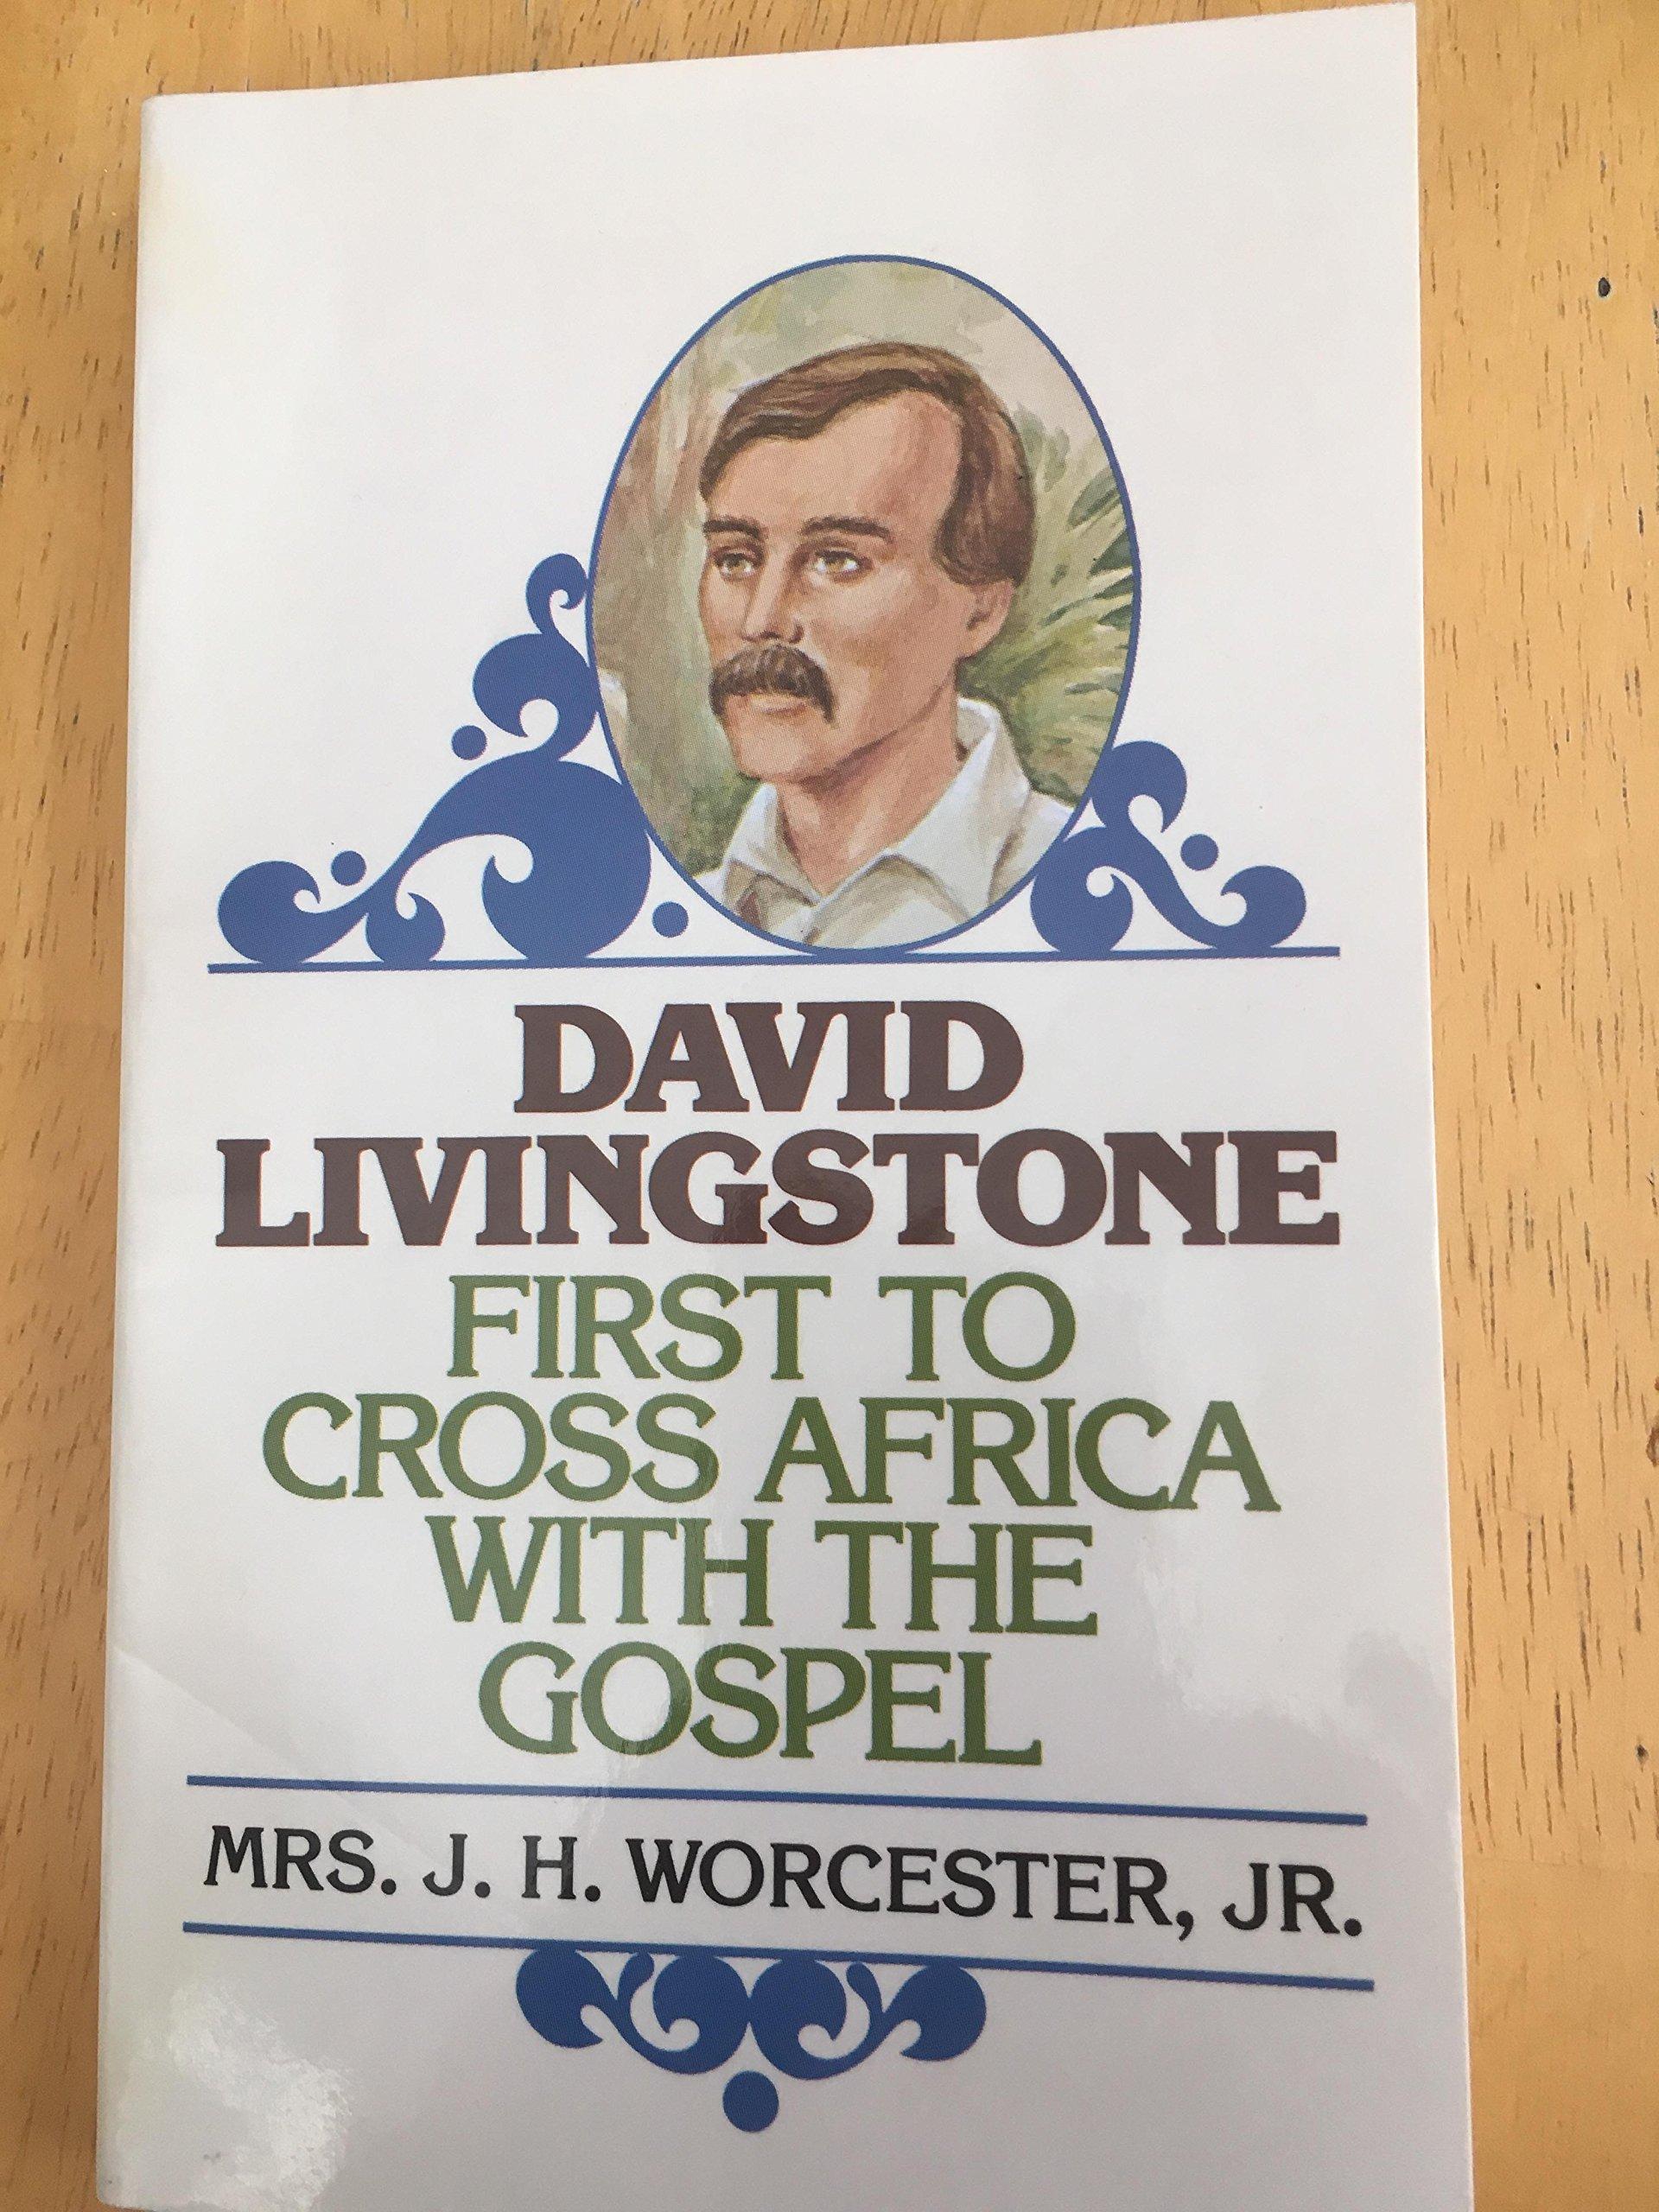 david livingstone timeline